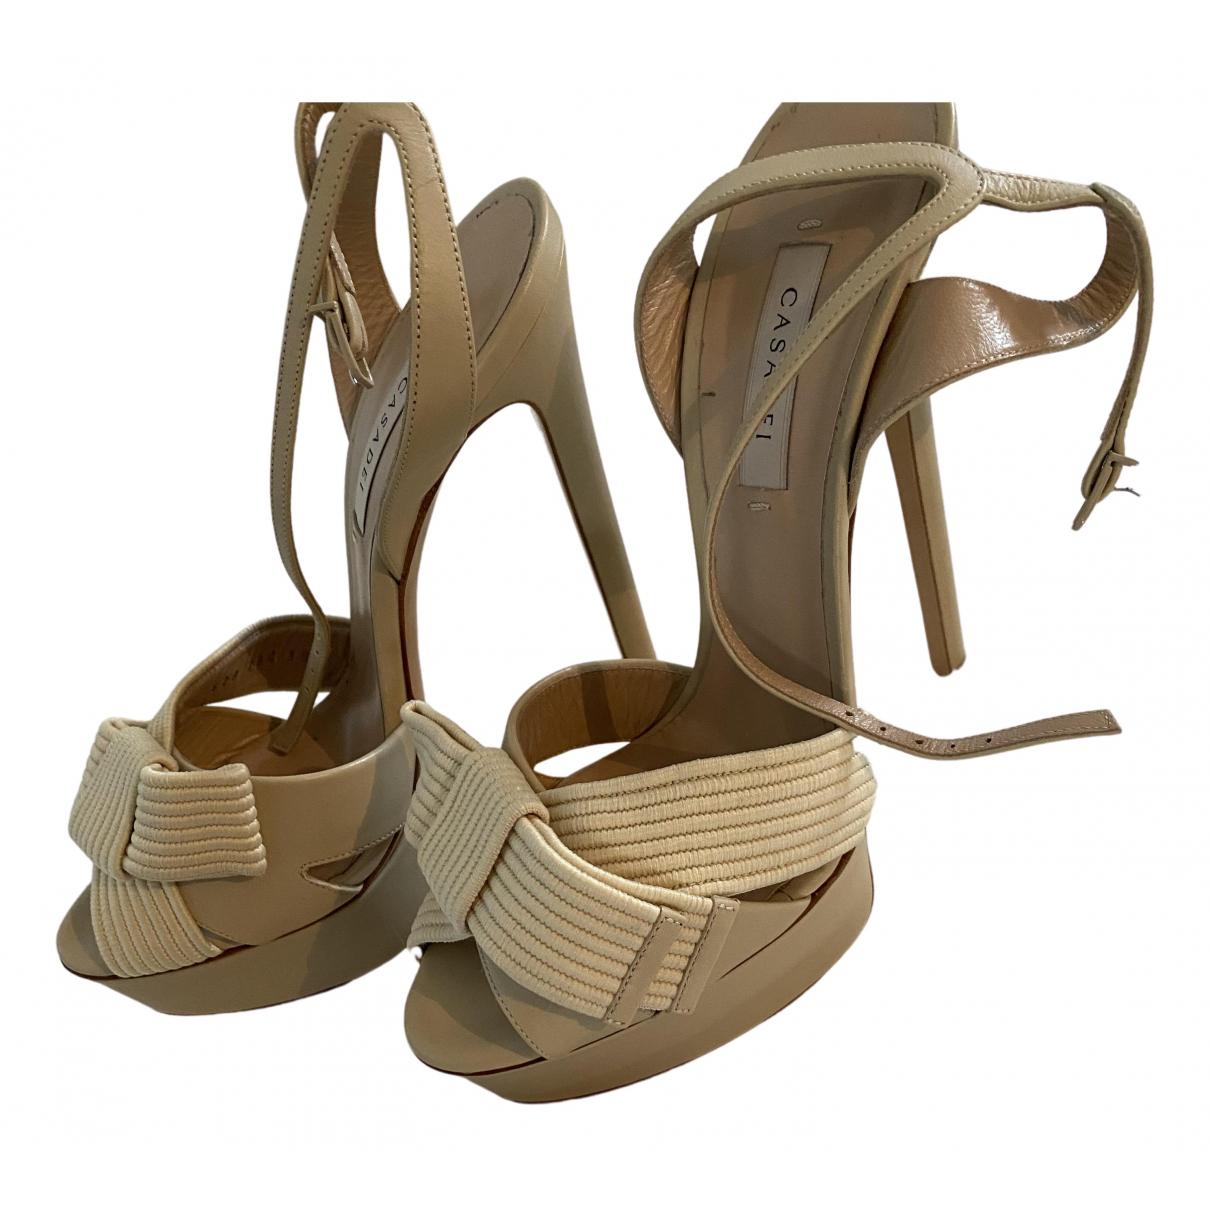 Casadei N Beige Leather Sandals for Women 39 EU